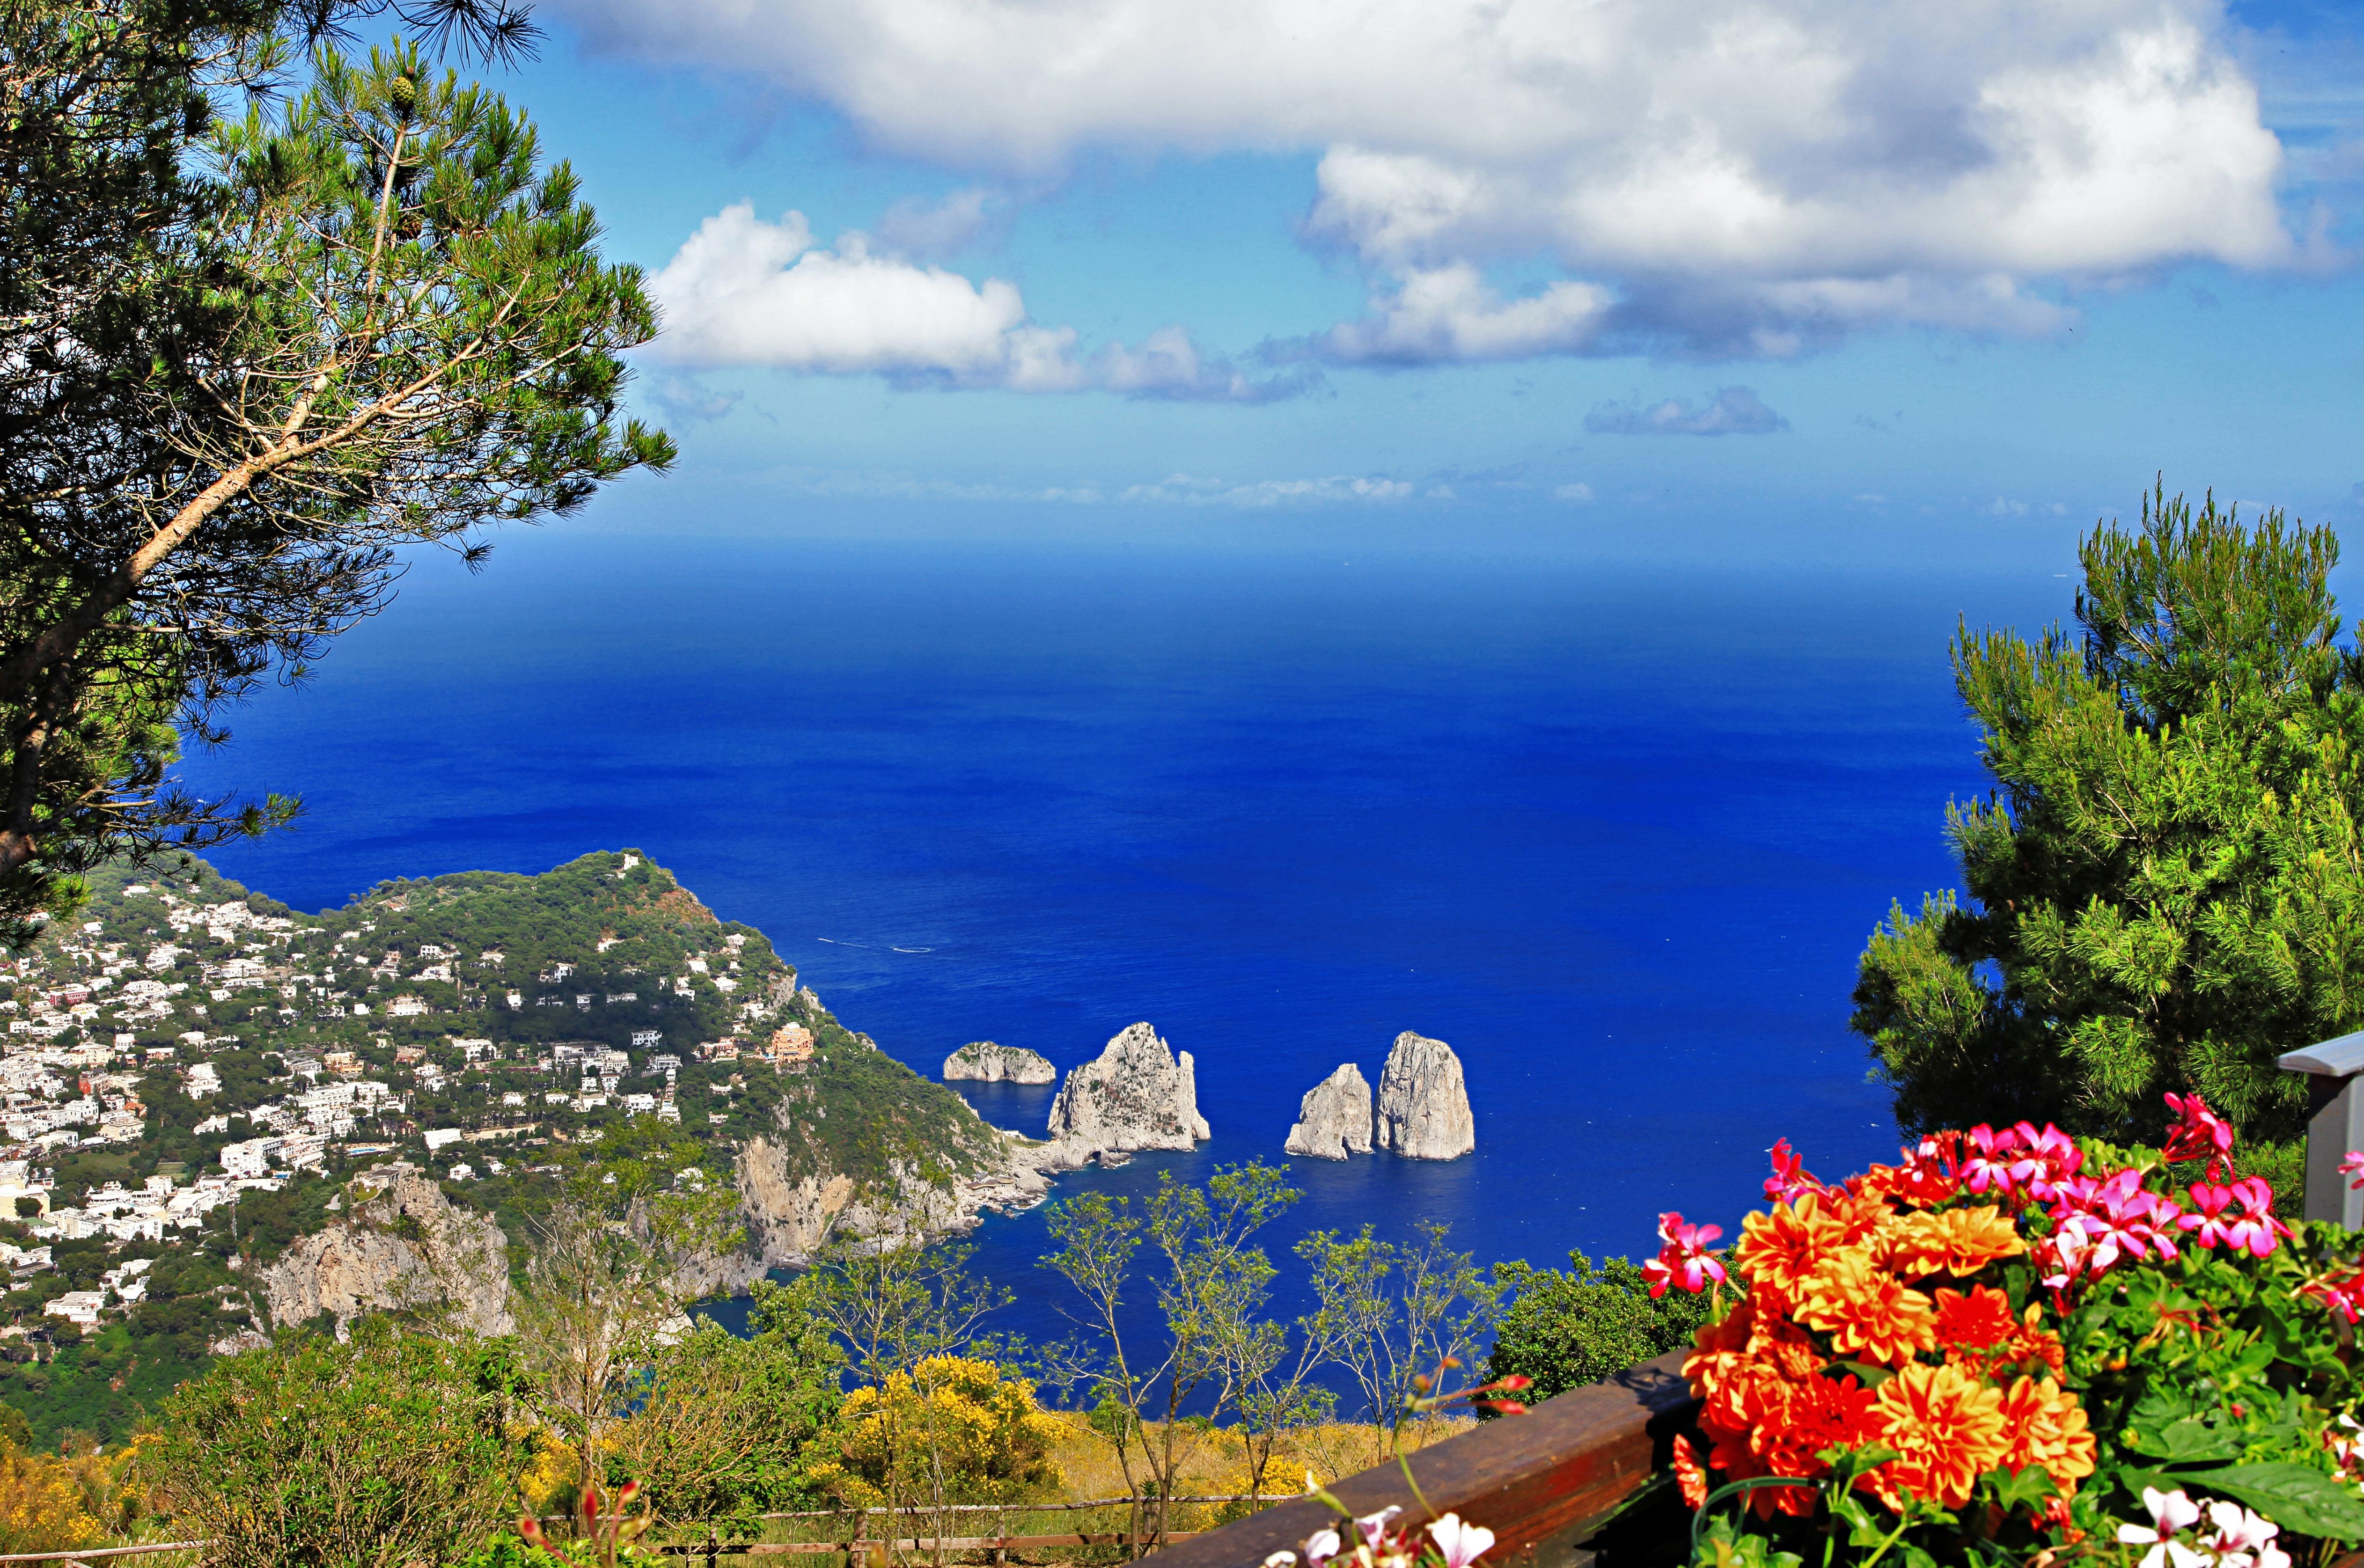 italy anacapri town capri island naples province italy wallpapers 5050x3350